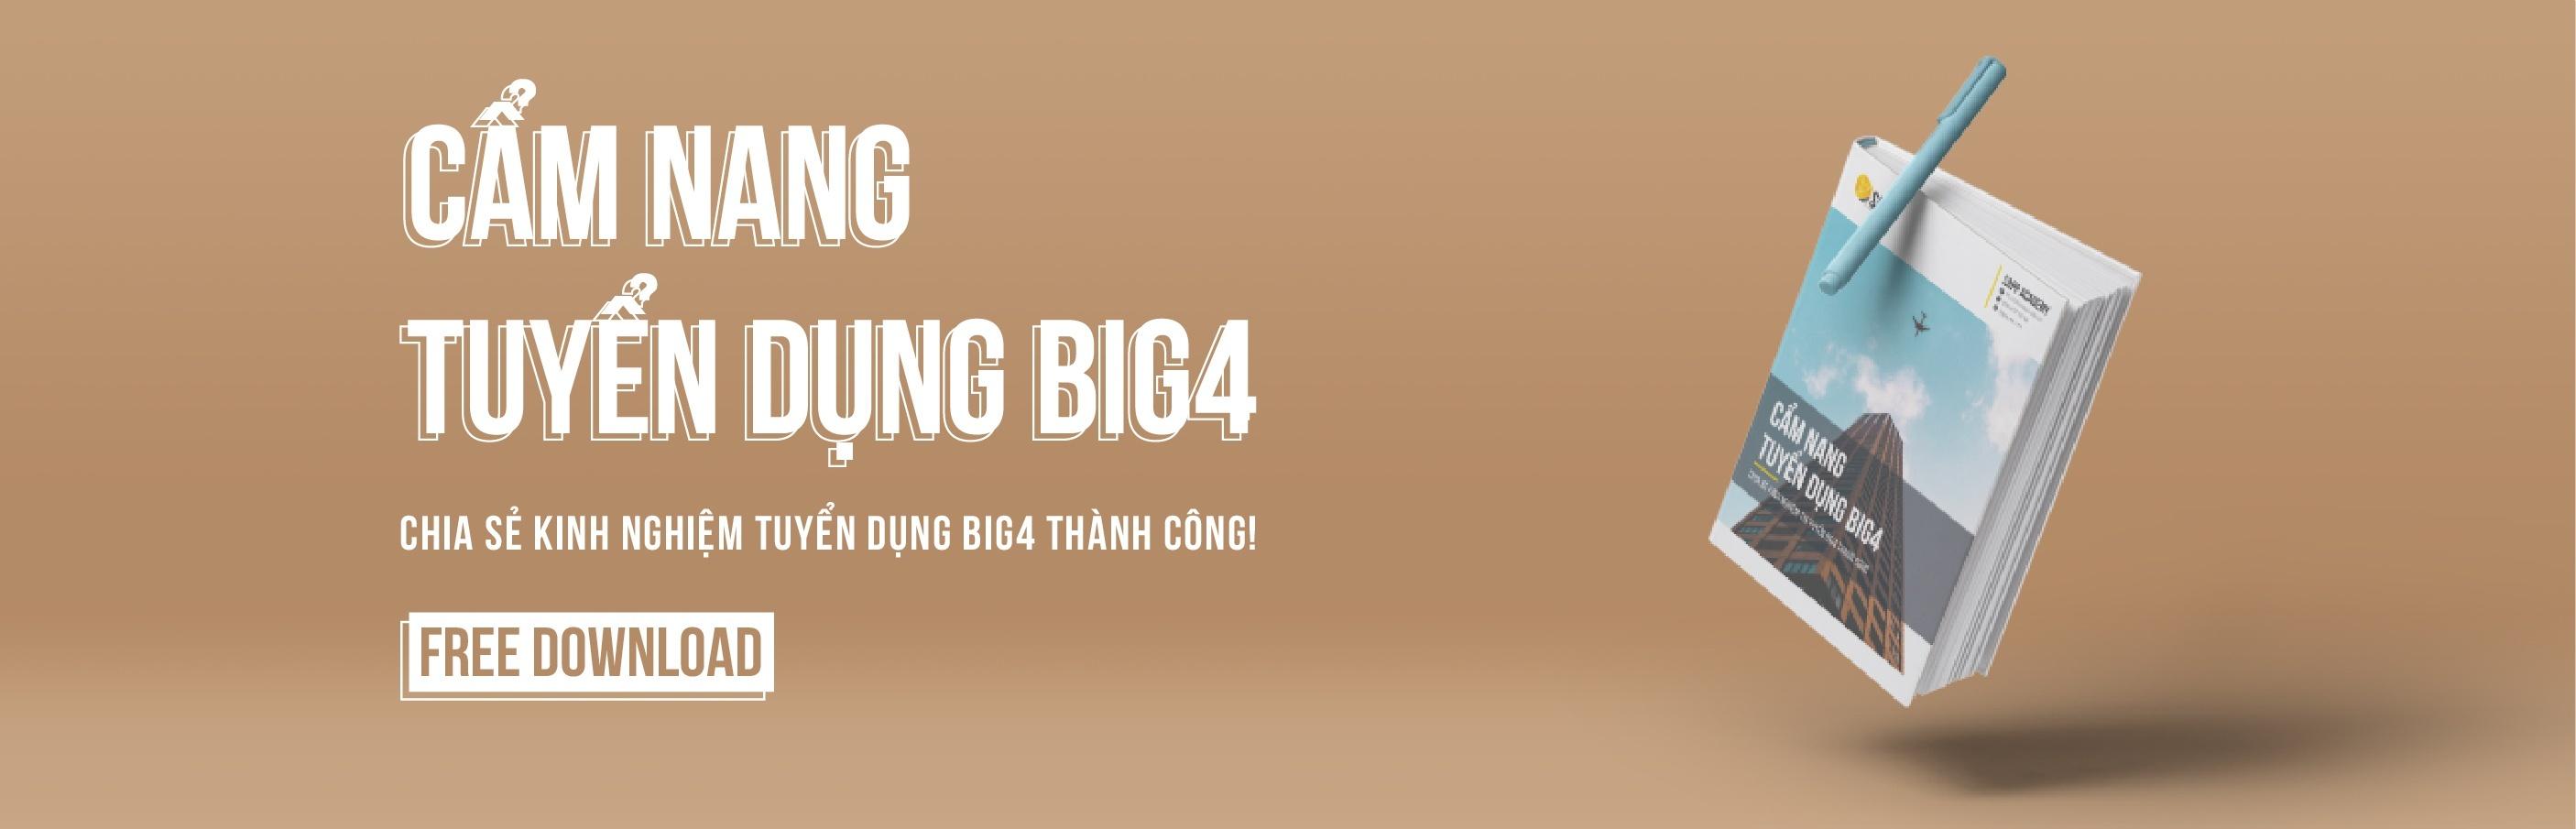 Free Download Cẩm Nang Tuyển Dụng BIG4 Version 5.0